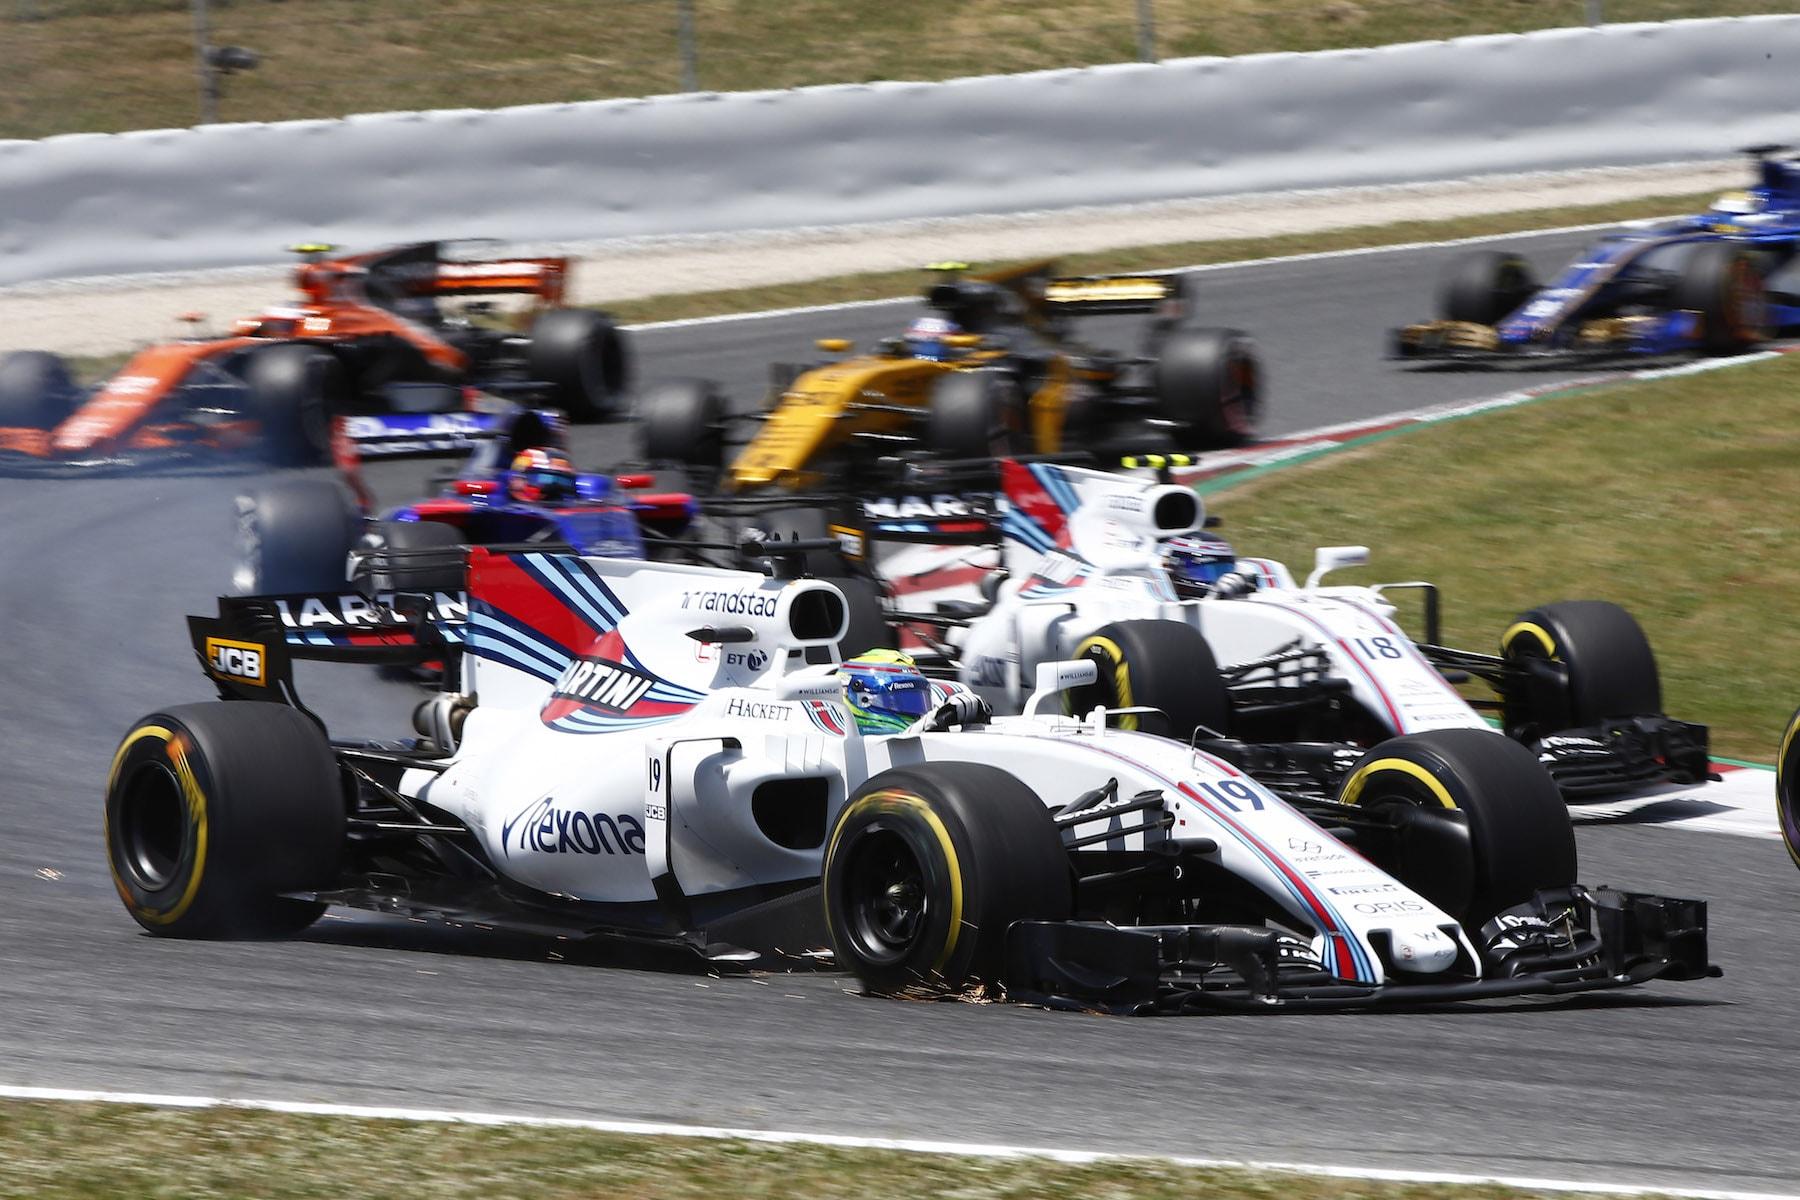 B 2017 Felipe Massa | Williams FW40 | 2017 Spanish GP 1 copy.jpg